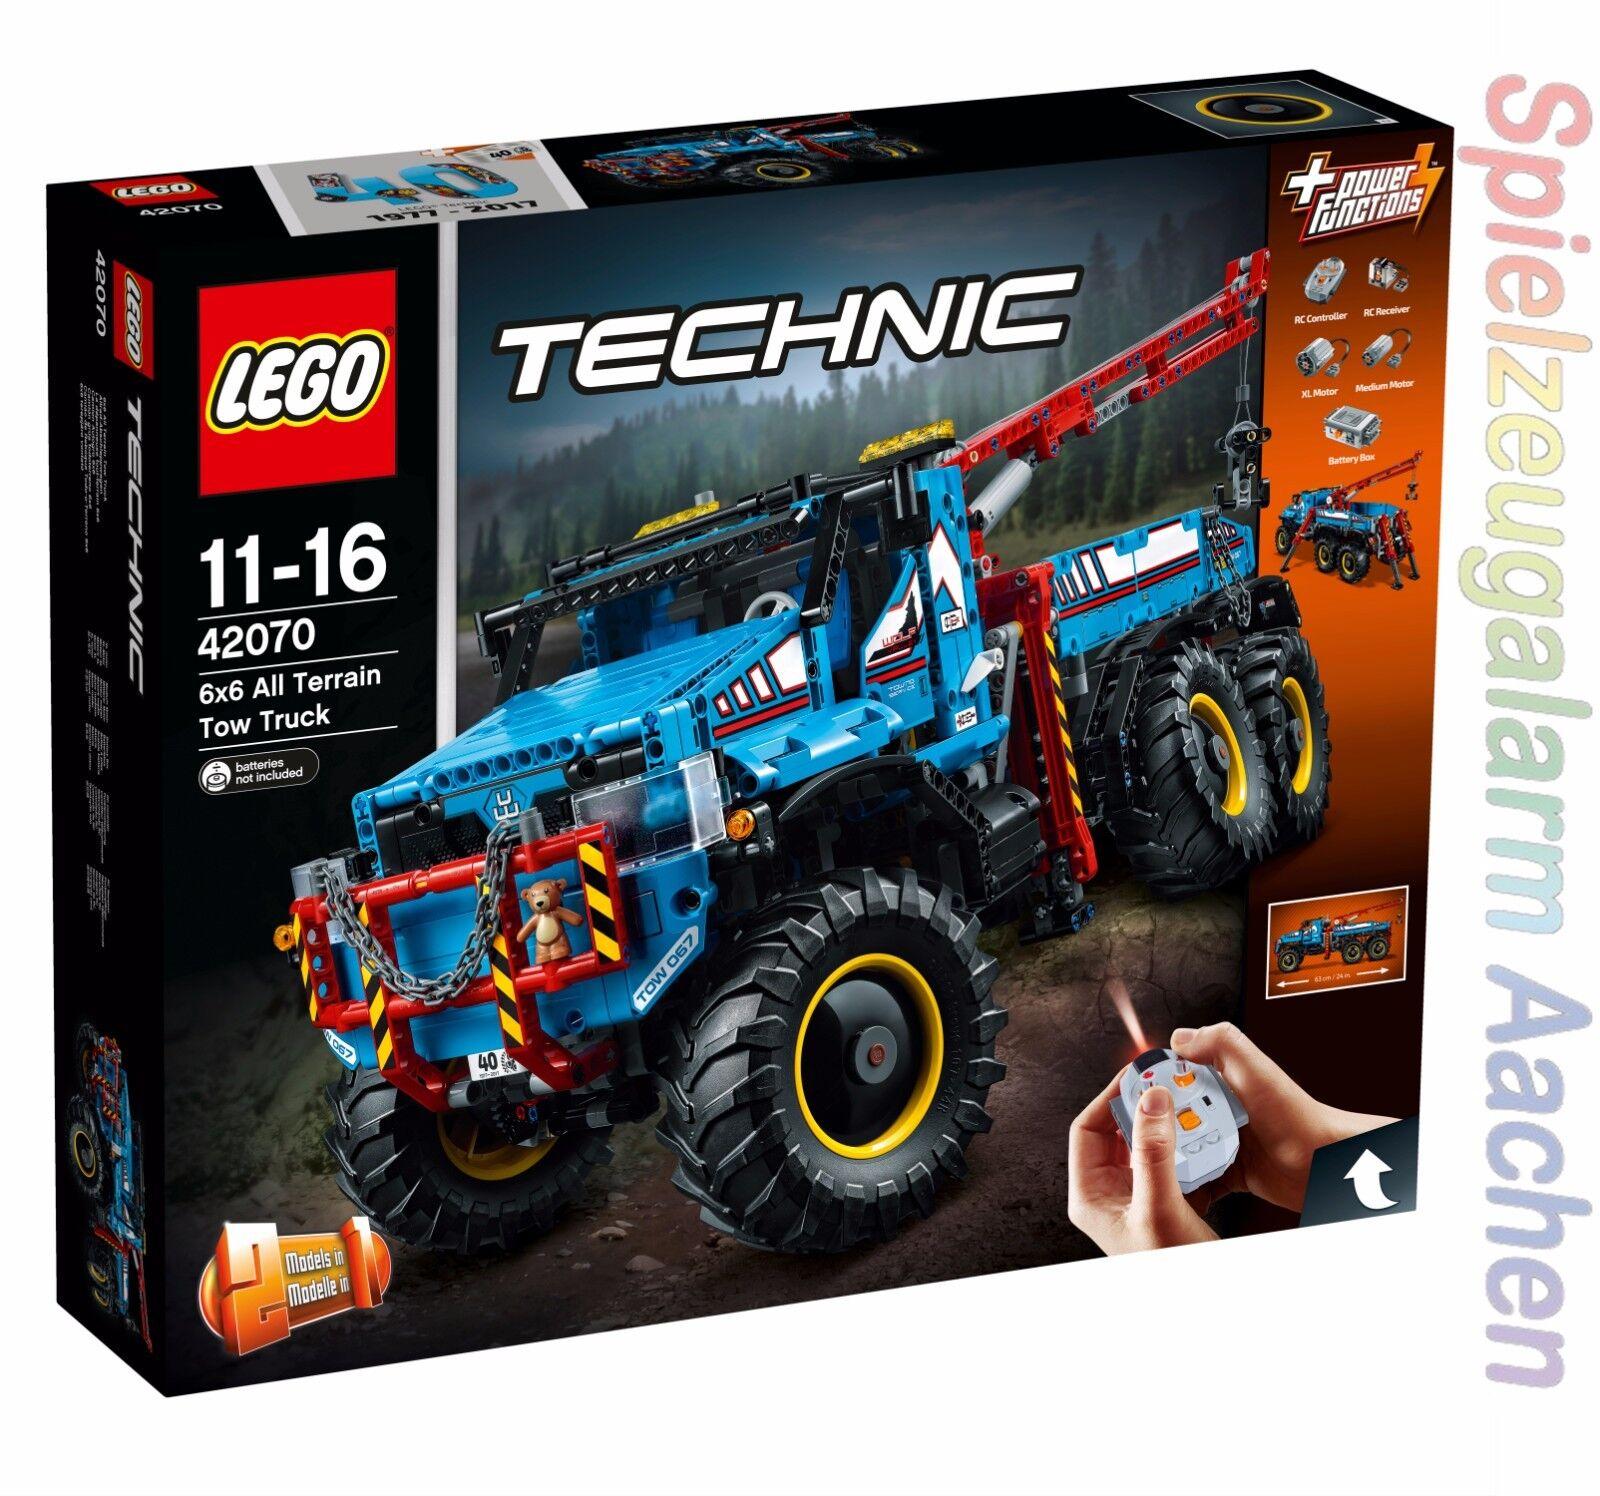 LEGO TEKNIK 42070 Allrad -Abschlepwagen La d 65533;rough 6553333; panneuse tout -terräng 6x6 N8  17